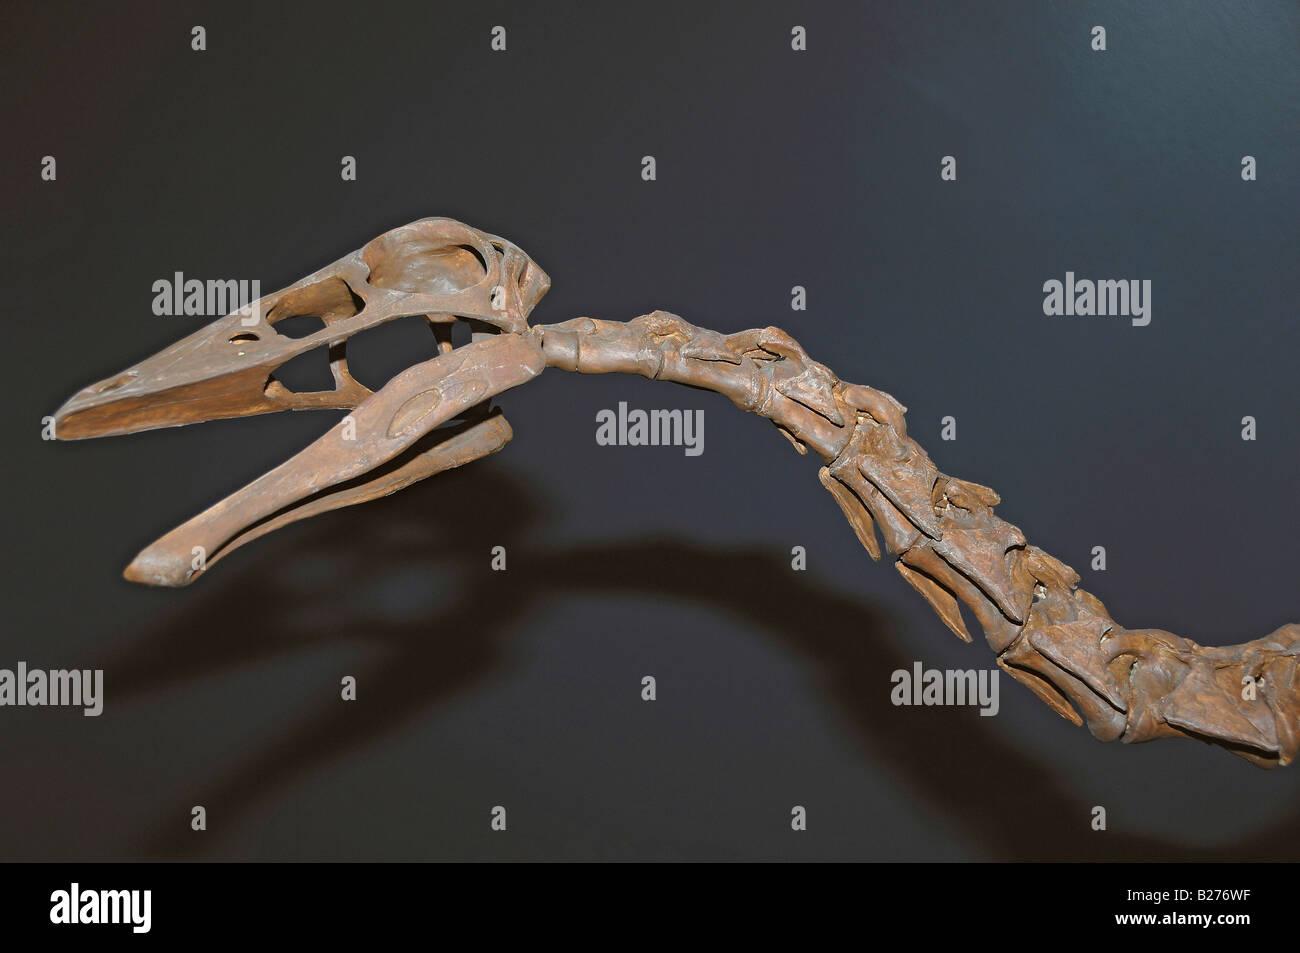 Dinosaur skeleton of Ornithomimus edmontonicus at The Royal Tyrrell Museum, Drumheller, Alberta, Canada - Stock Image